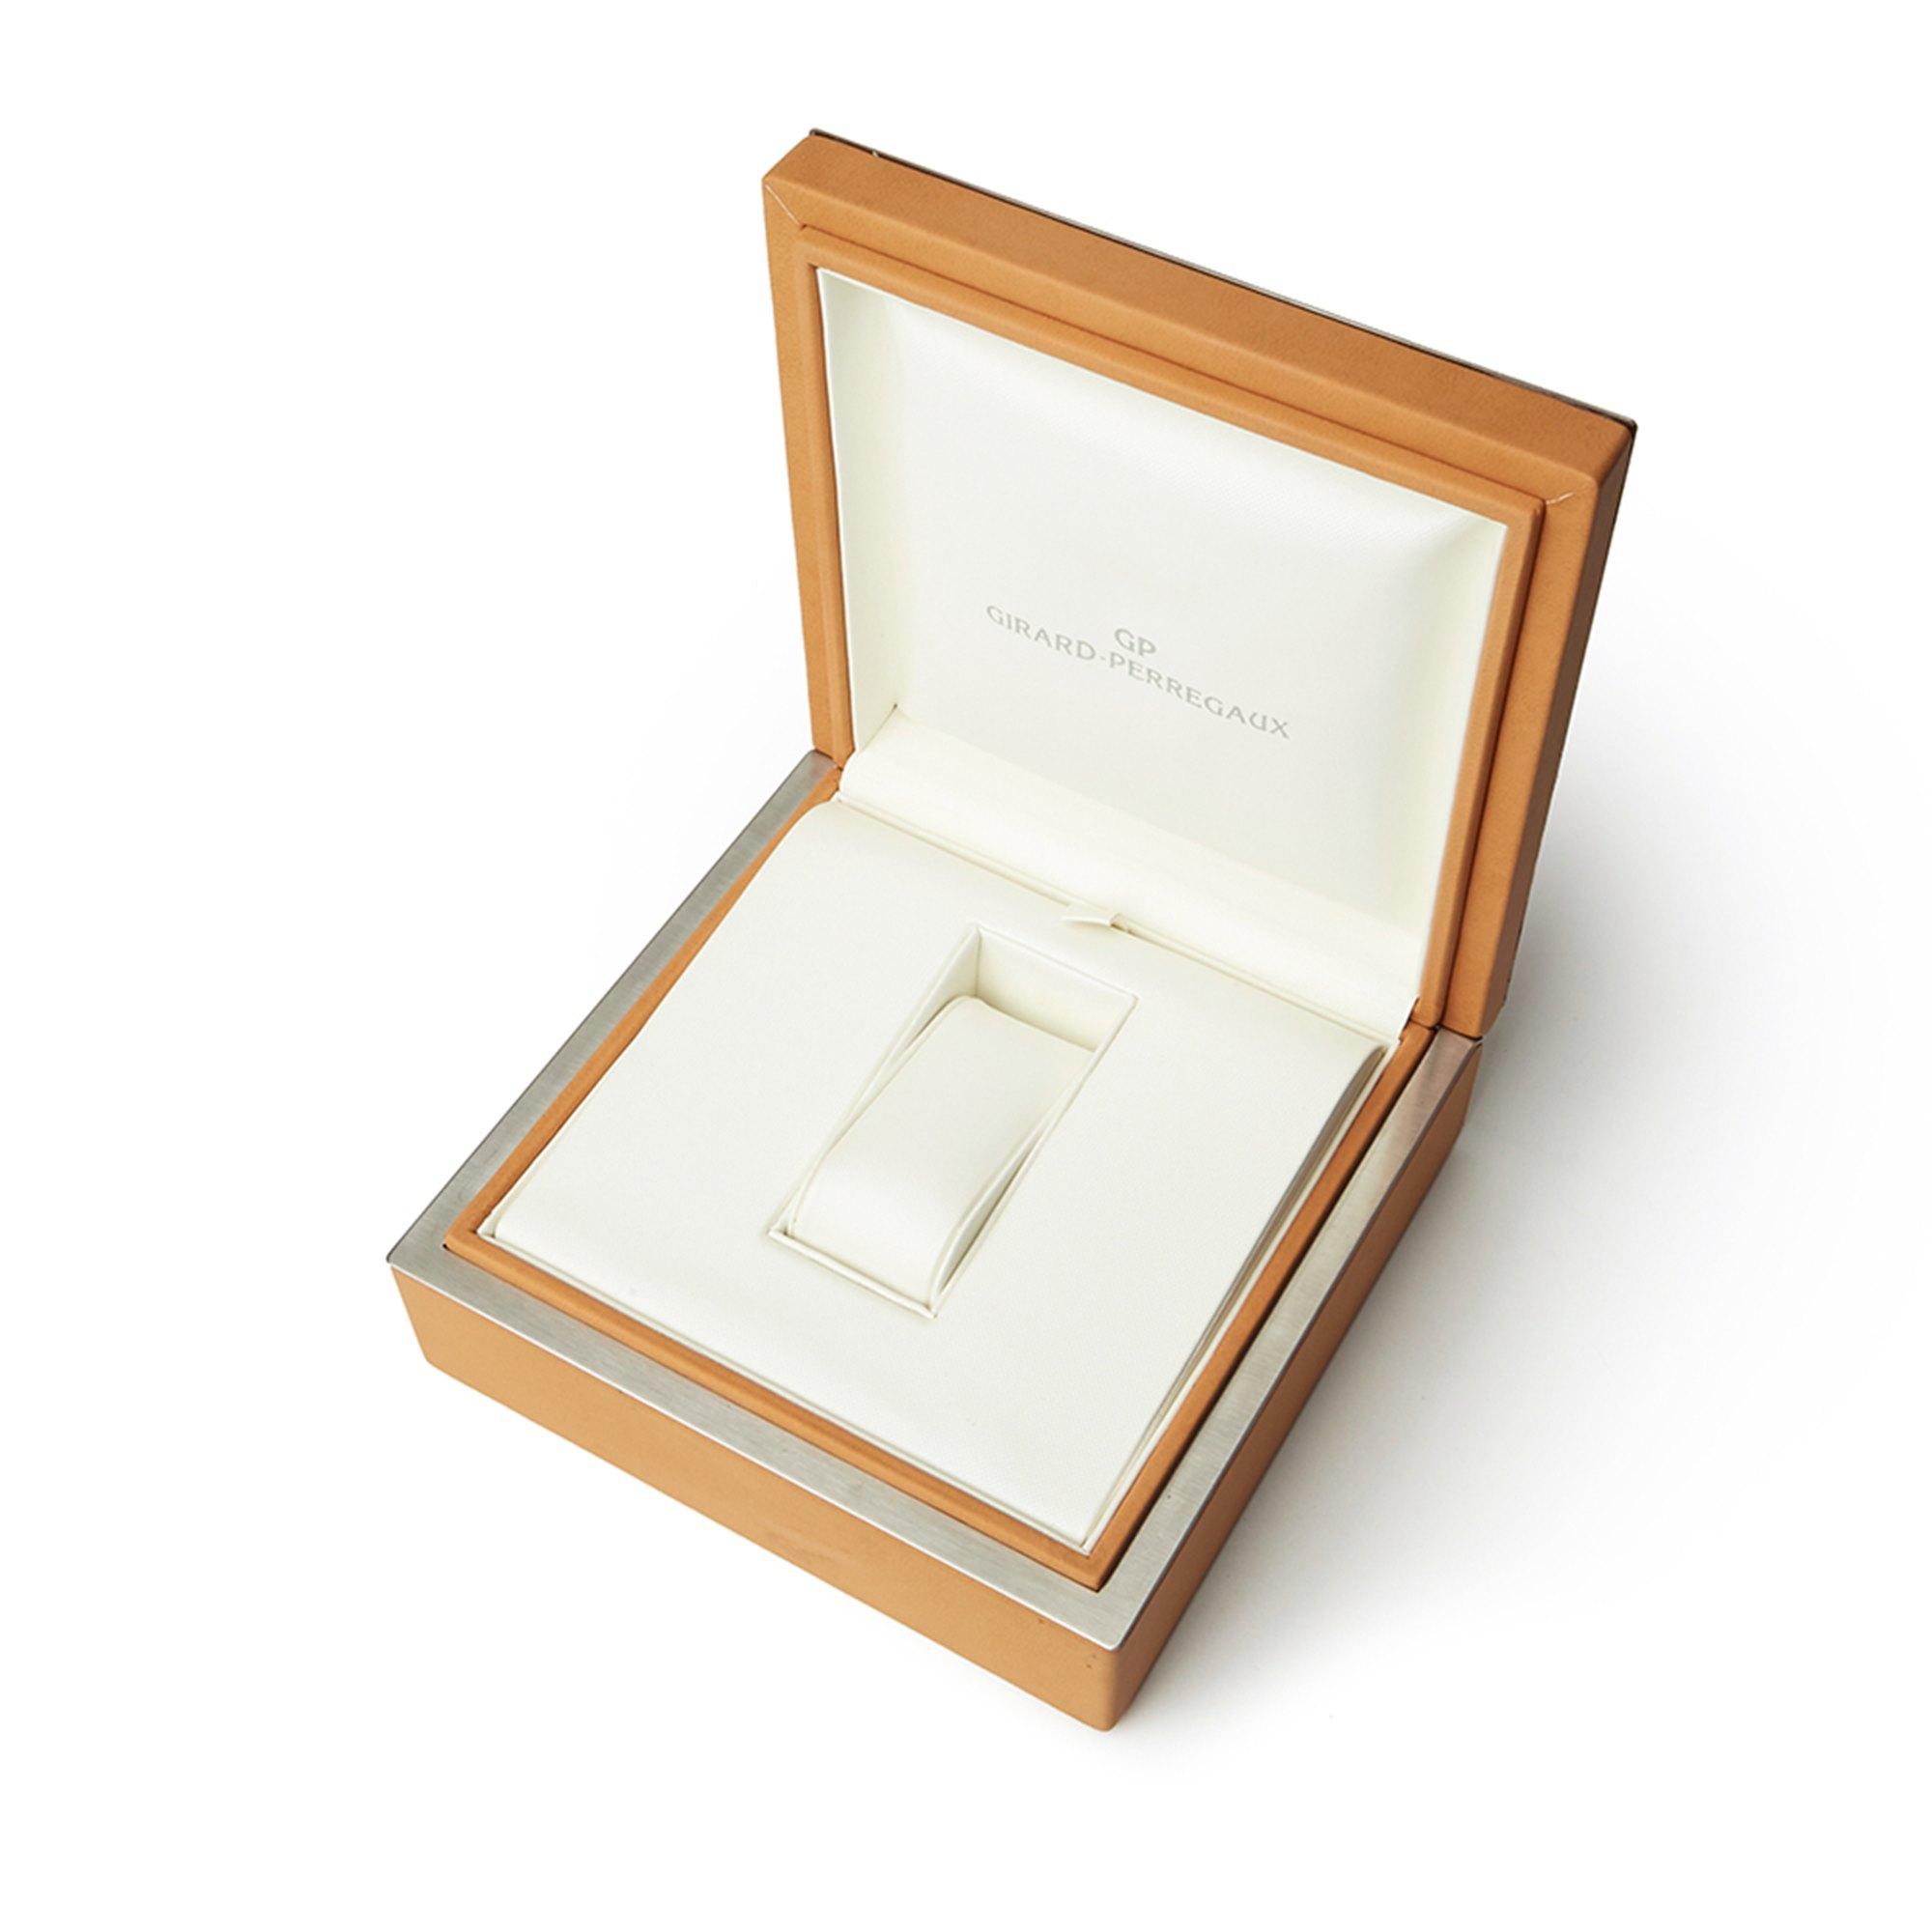 Girard Perregaux Richeville Chronograph 18K White Gold 2710